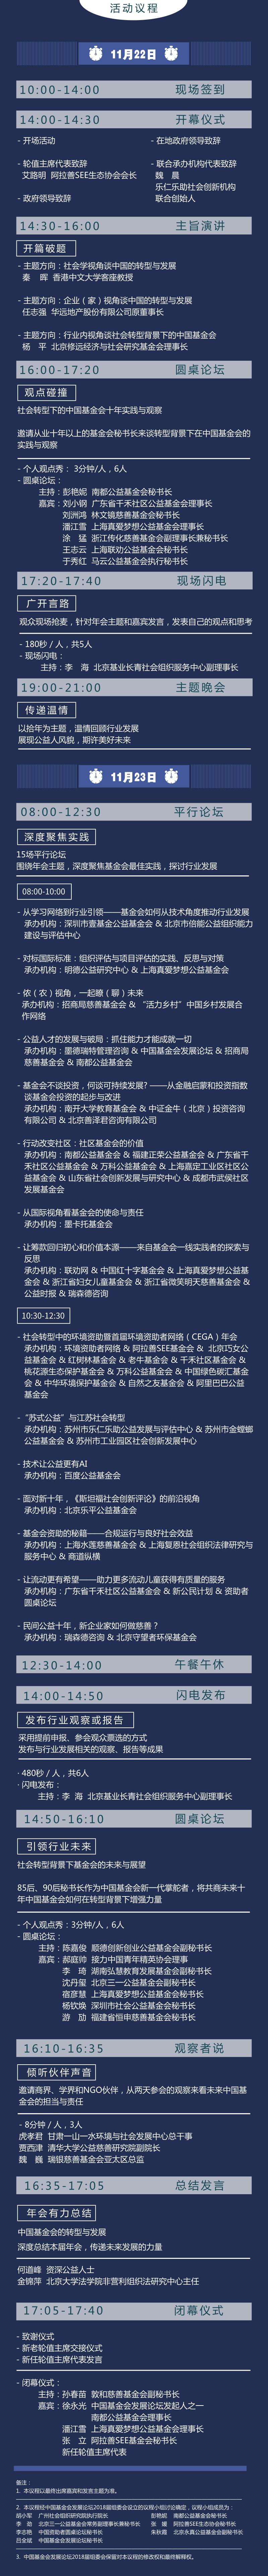 2018年会议程图-20181106.png